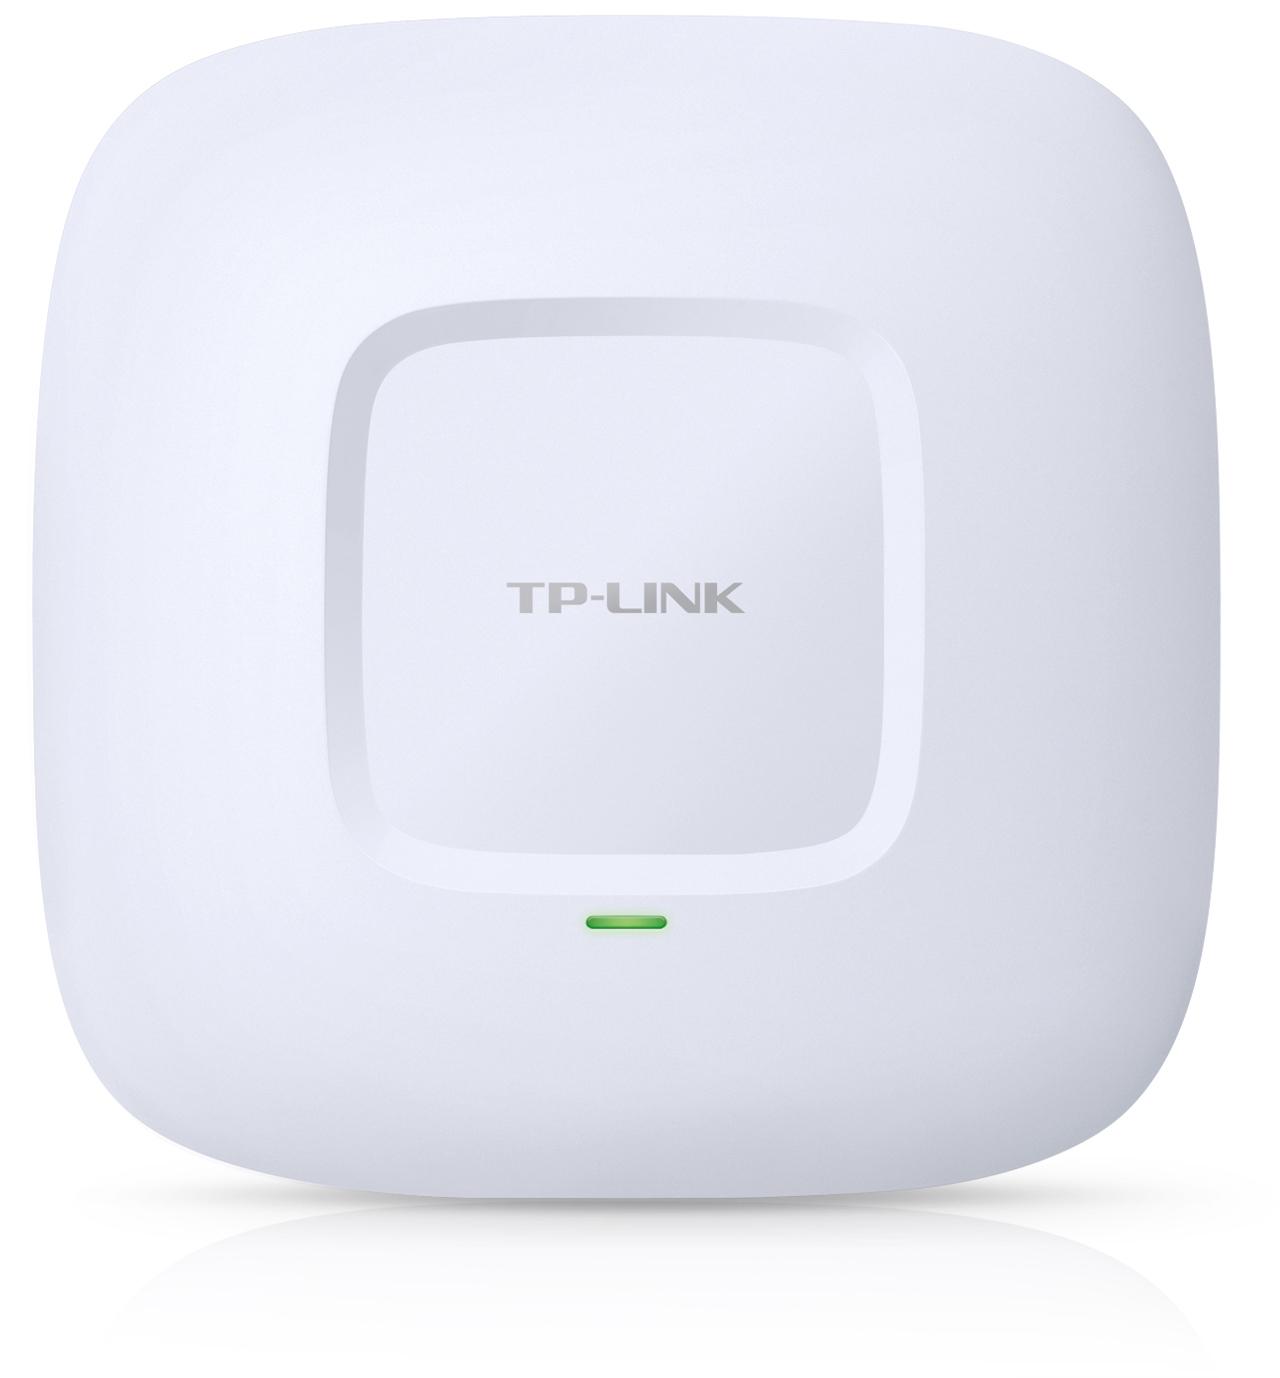 Point d'accès Wi-Fi N 300Mbps PoE Gigabit – Plafonnier